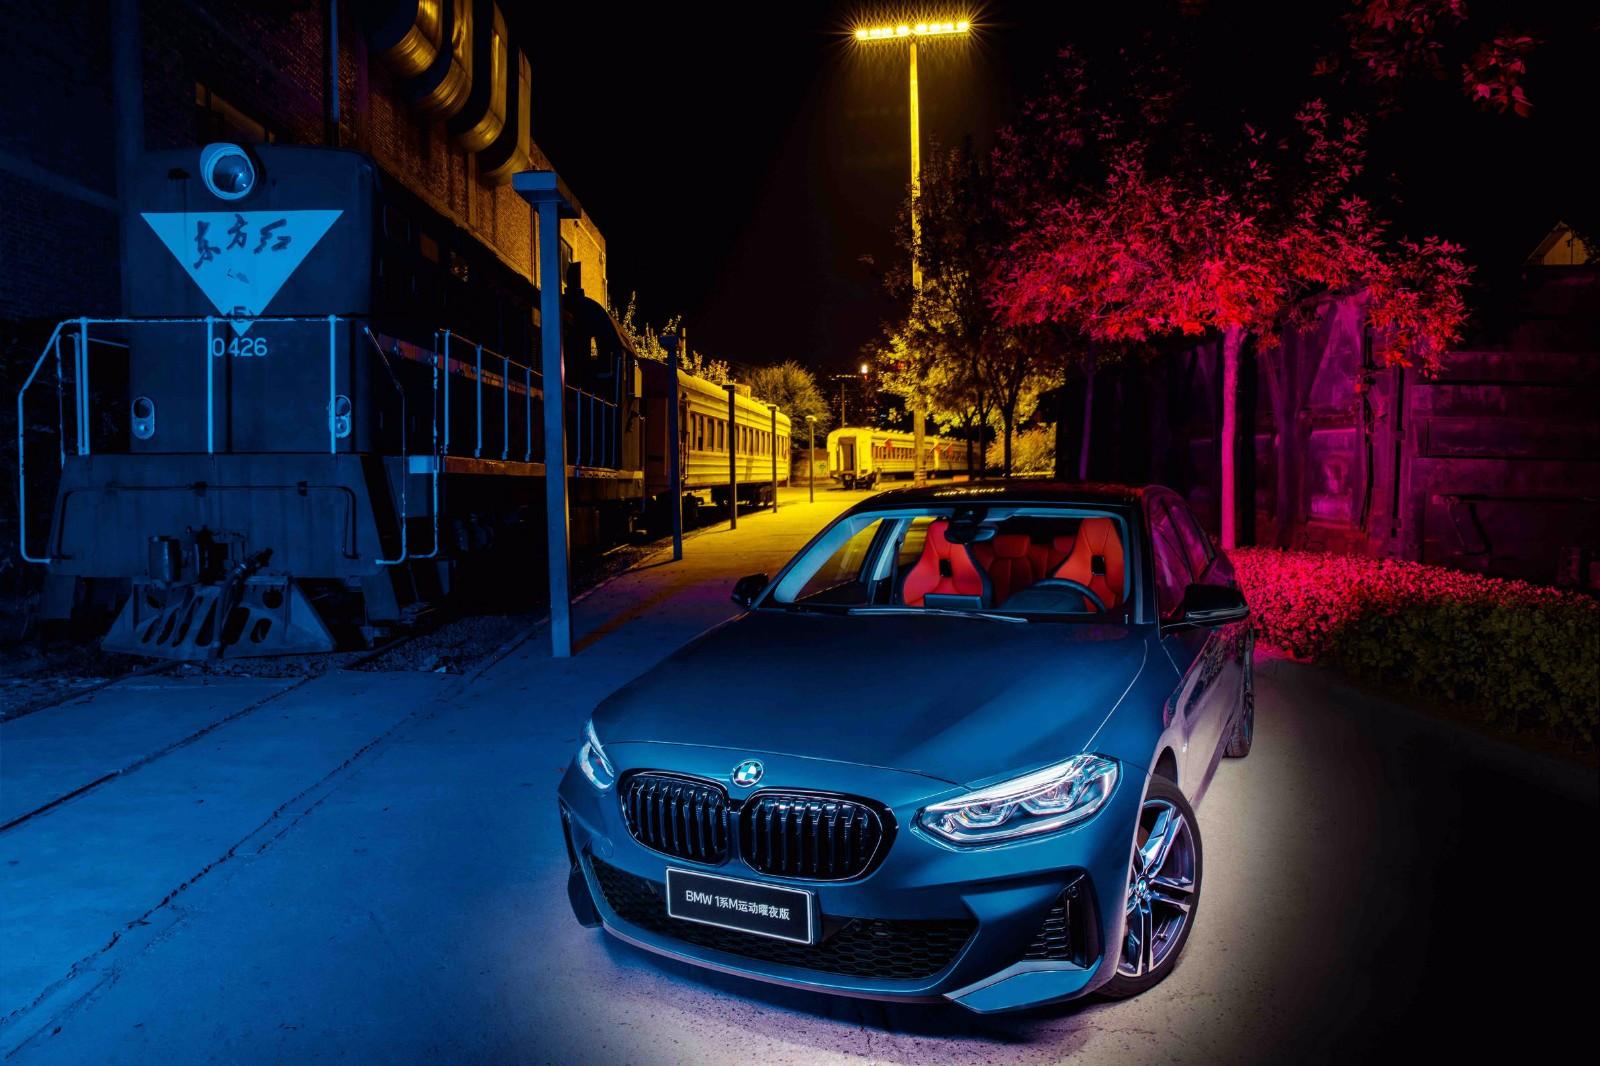 "01.BMW 1系M运动曜夜版 ""北京1夜""媒体试驾.jpg"